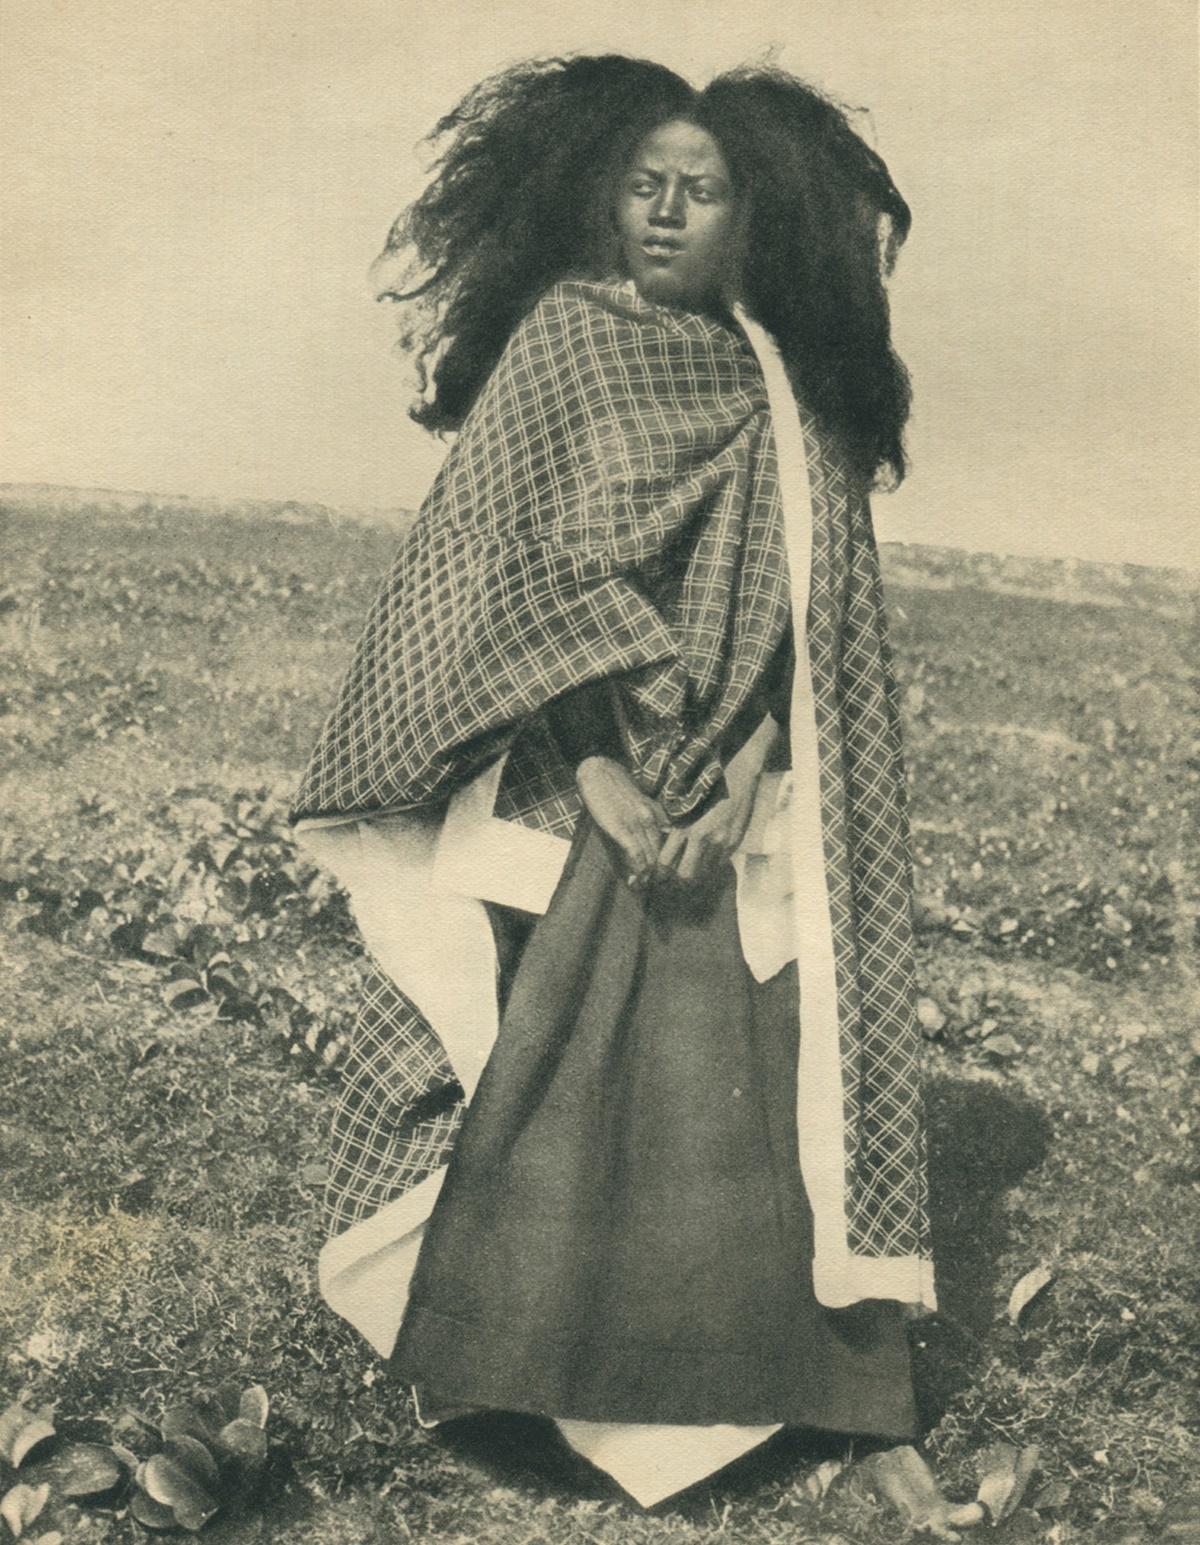 Vintage photographs of women of Madagascar, #Africa. http://t.co/9936CJqPjt